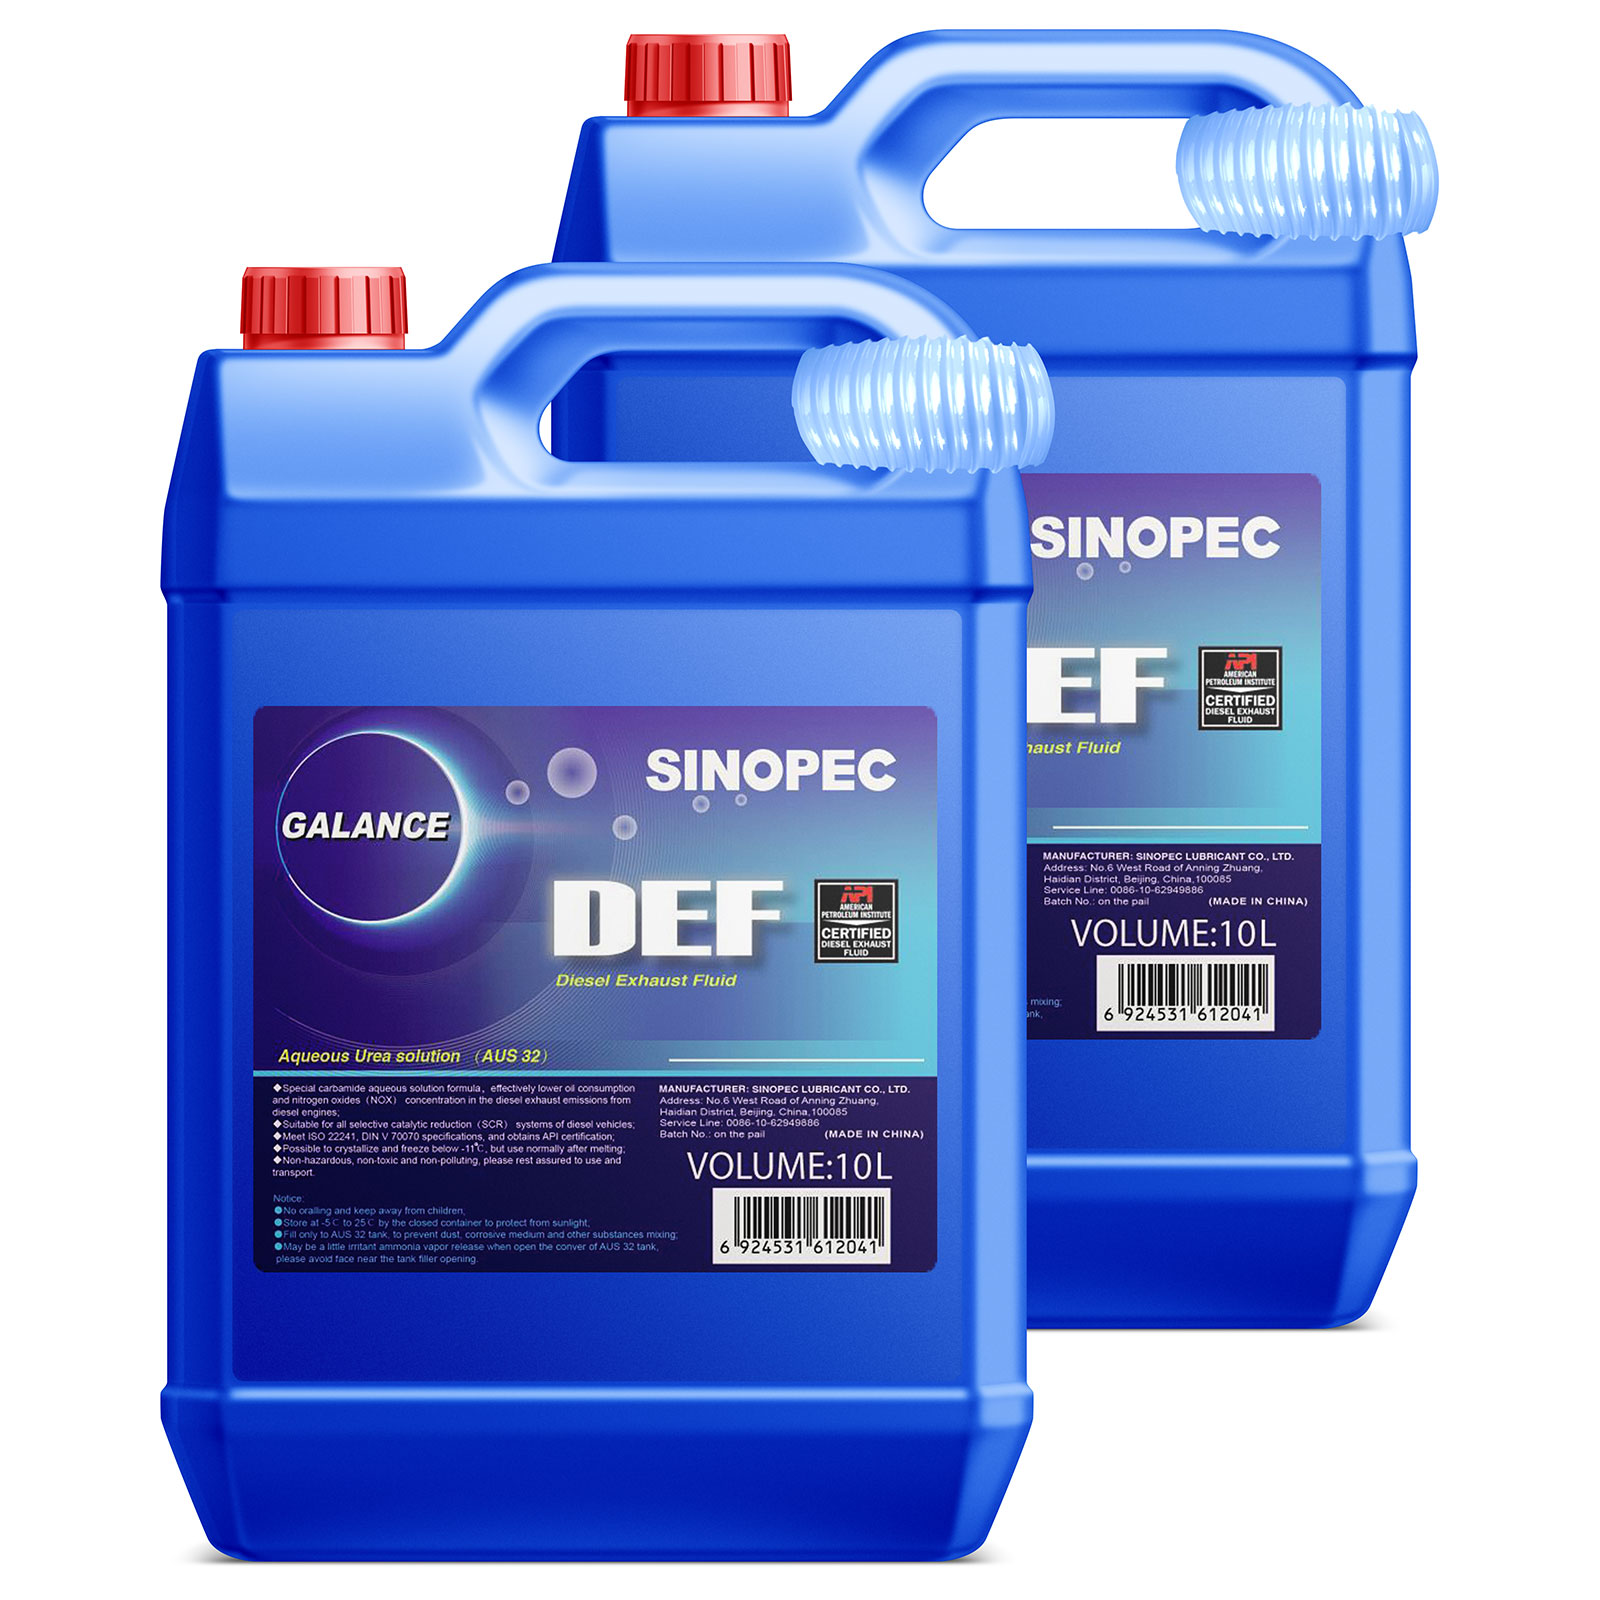 Sinopec DEF Diesel Exhaust Fluid - (2) 2.5 Gallon Jugs